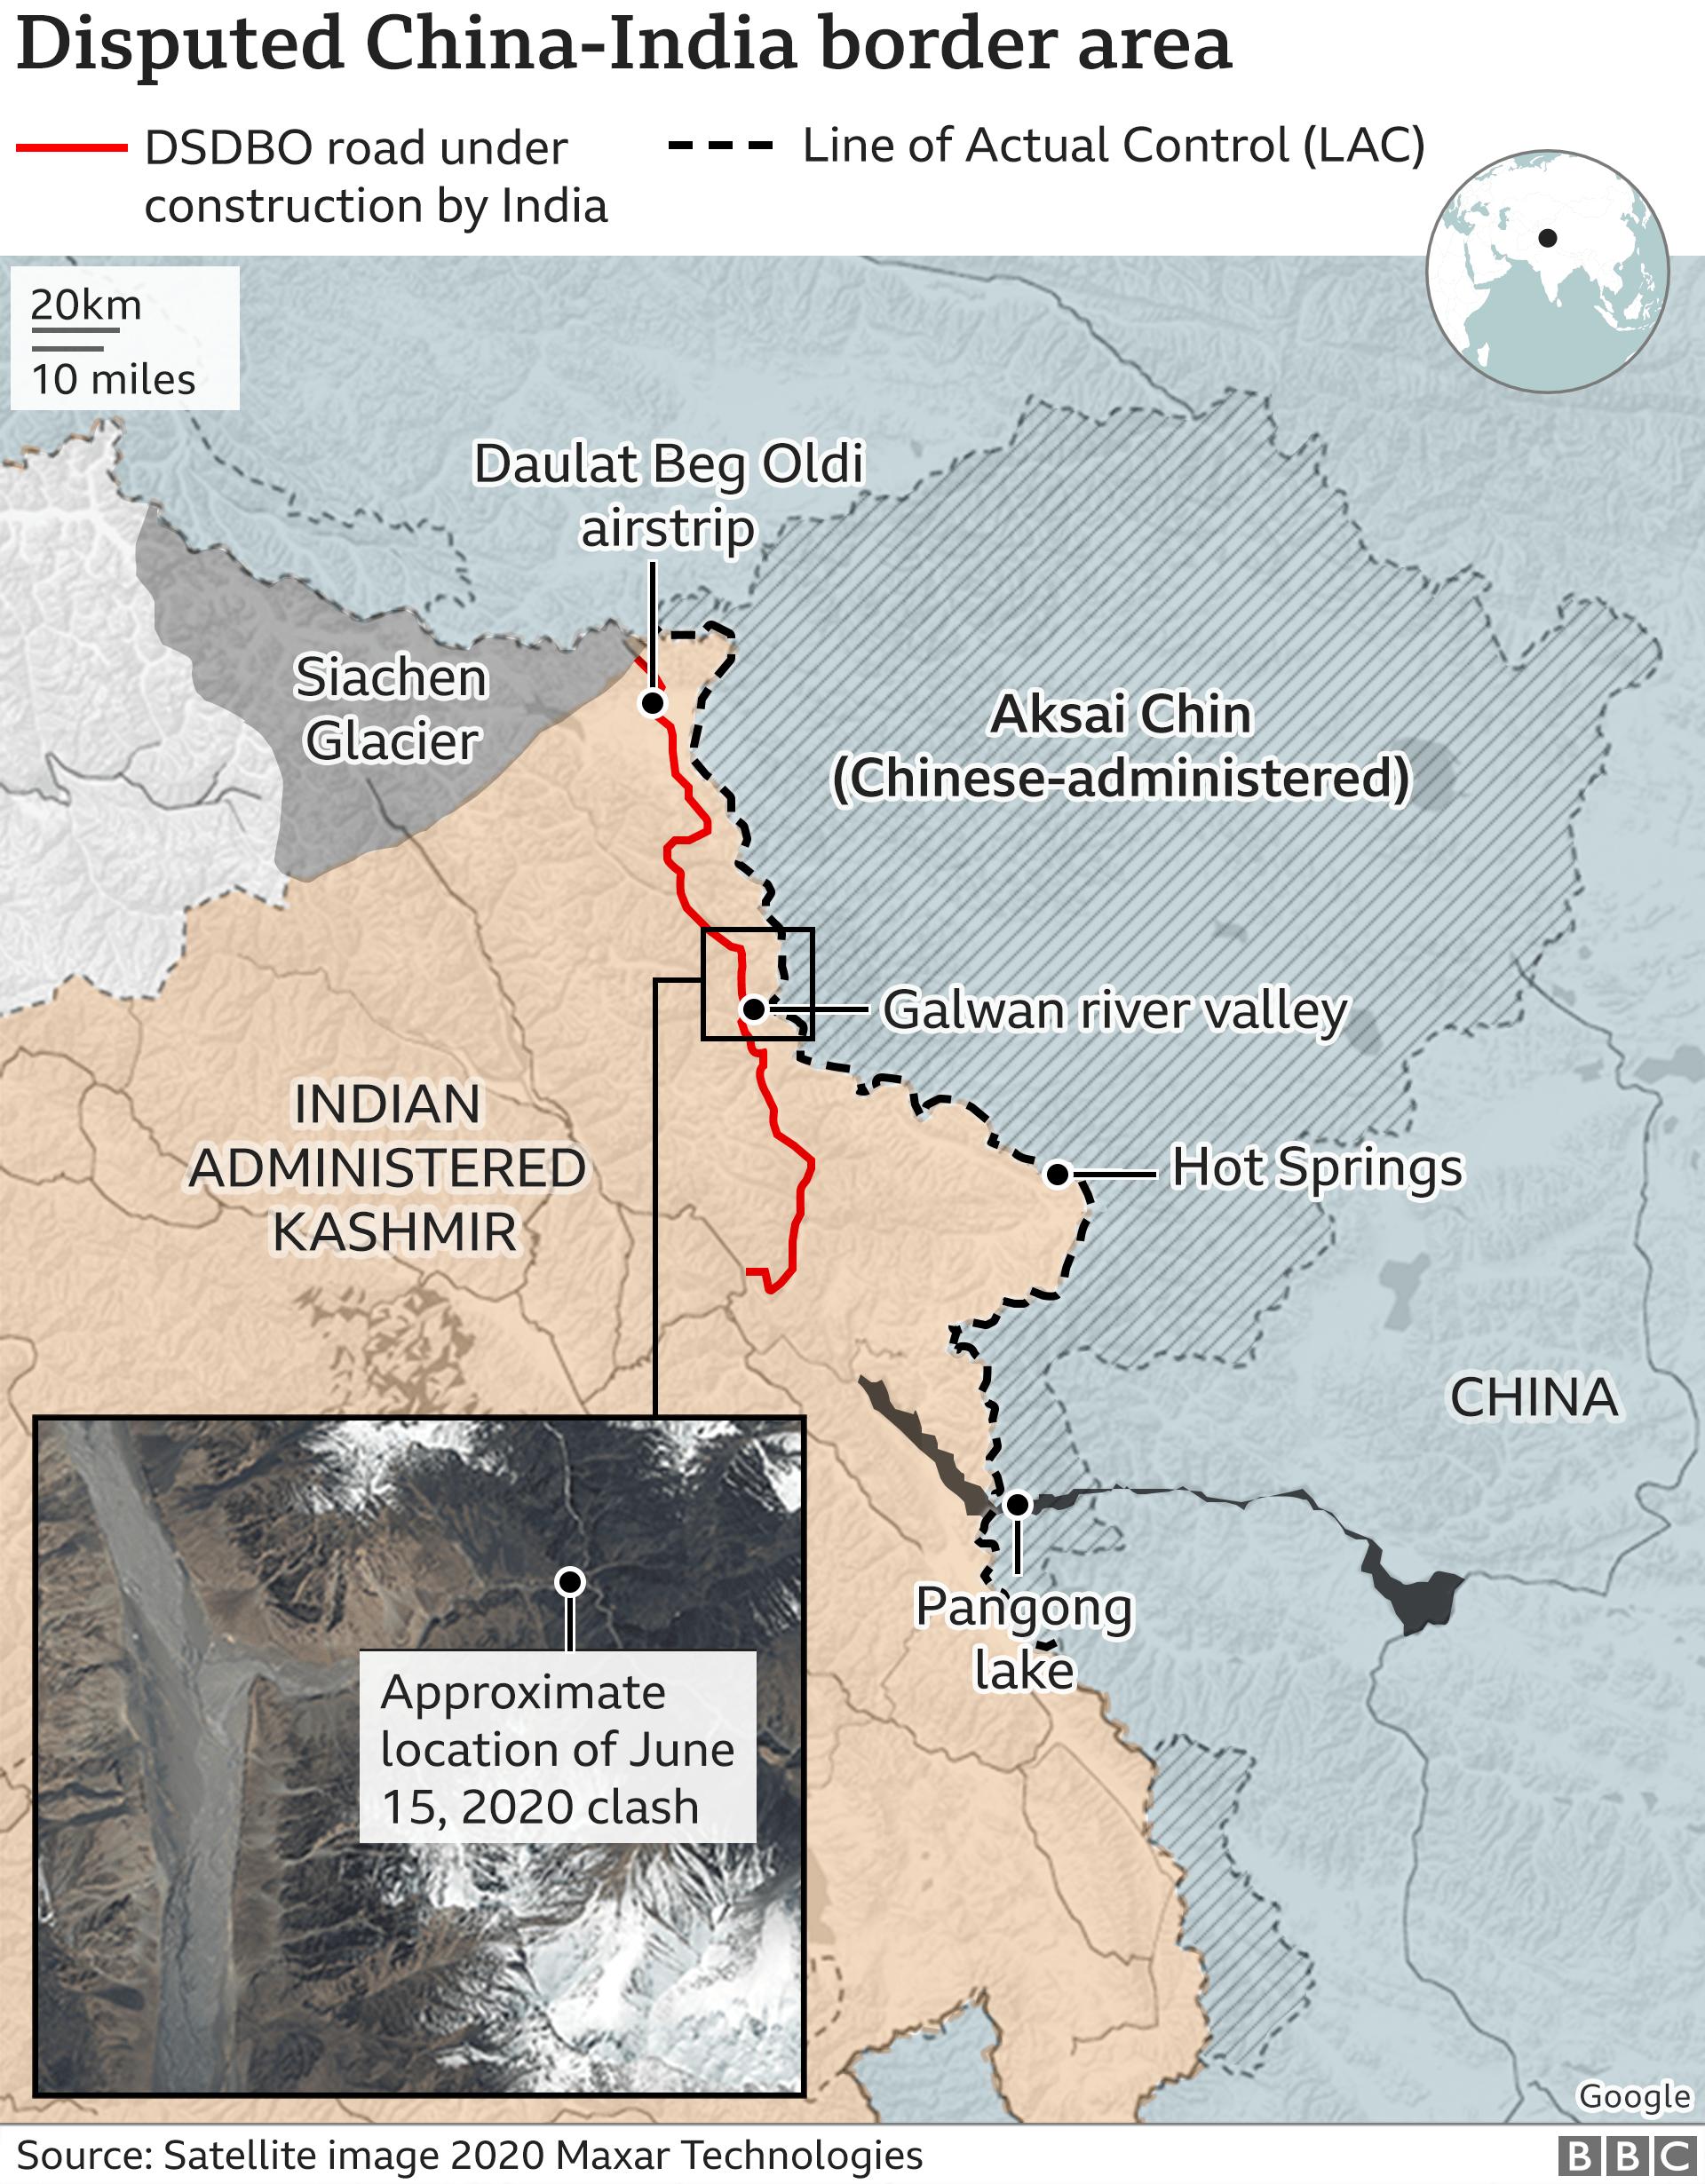 Disputed China-India border map